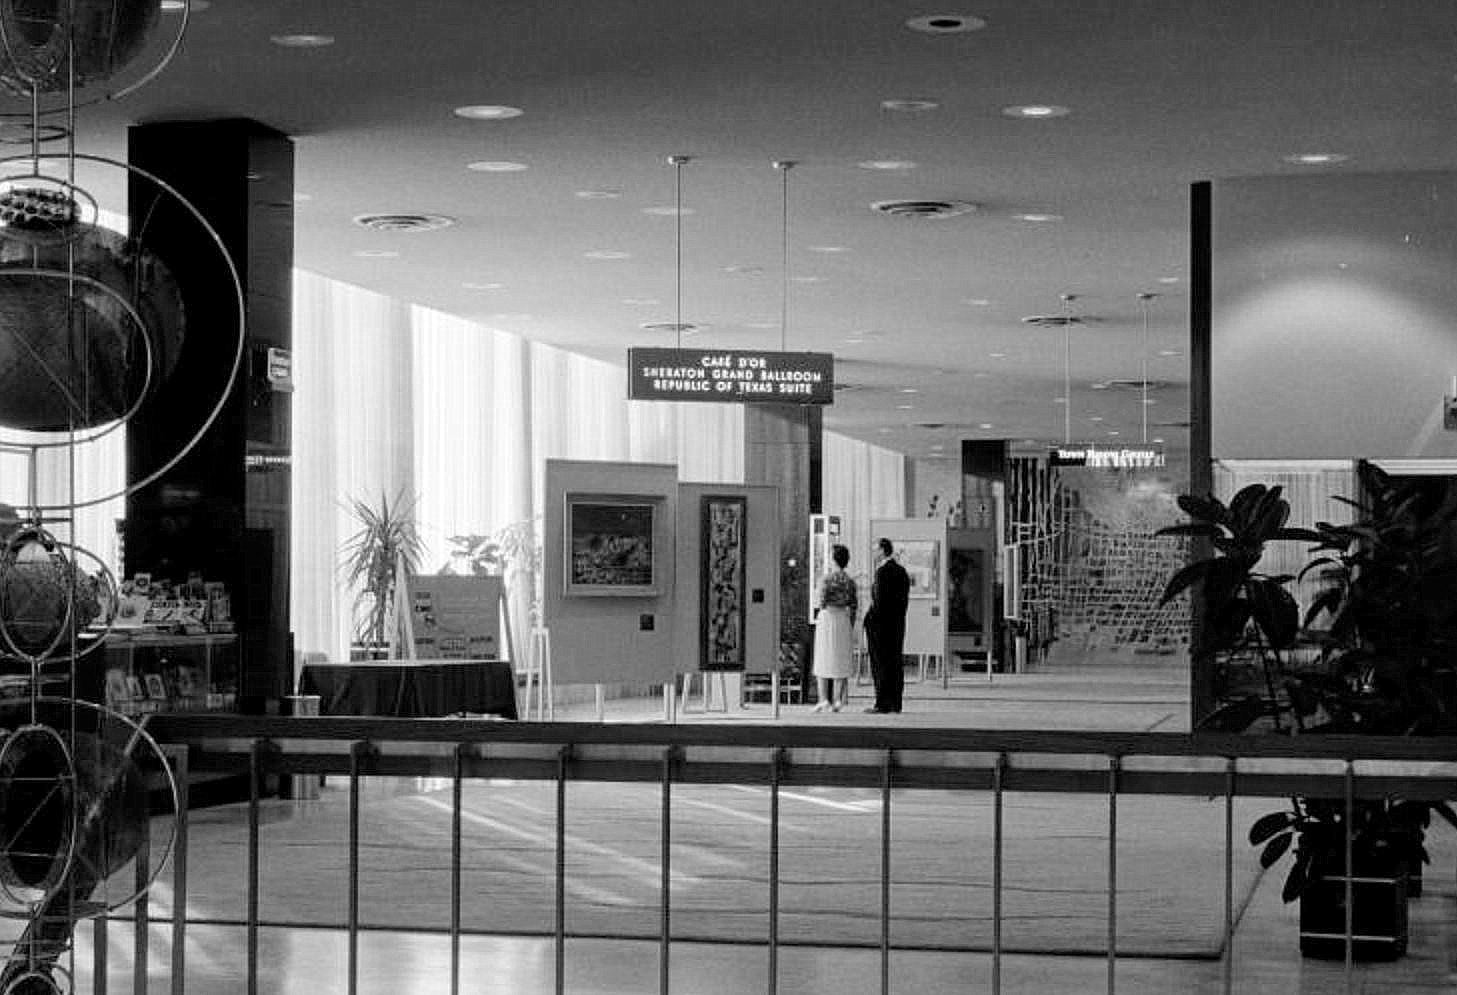 southland-ctr_john-rogers_1959-60_portal_stairs-escalators_kepes-det